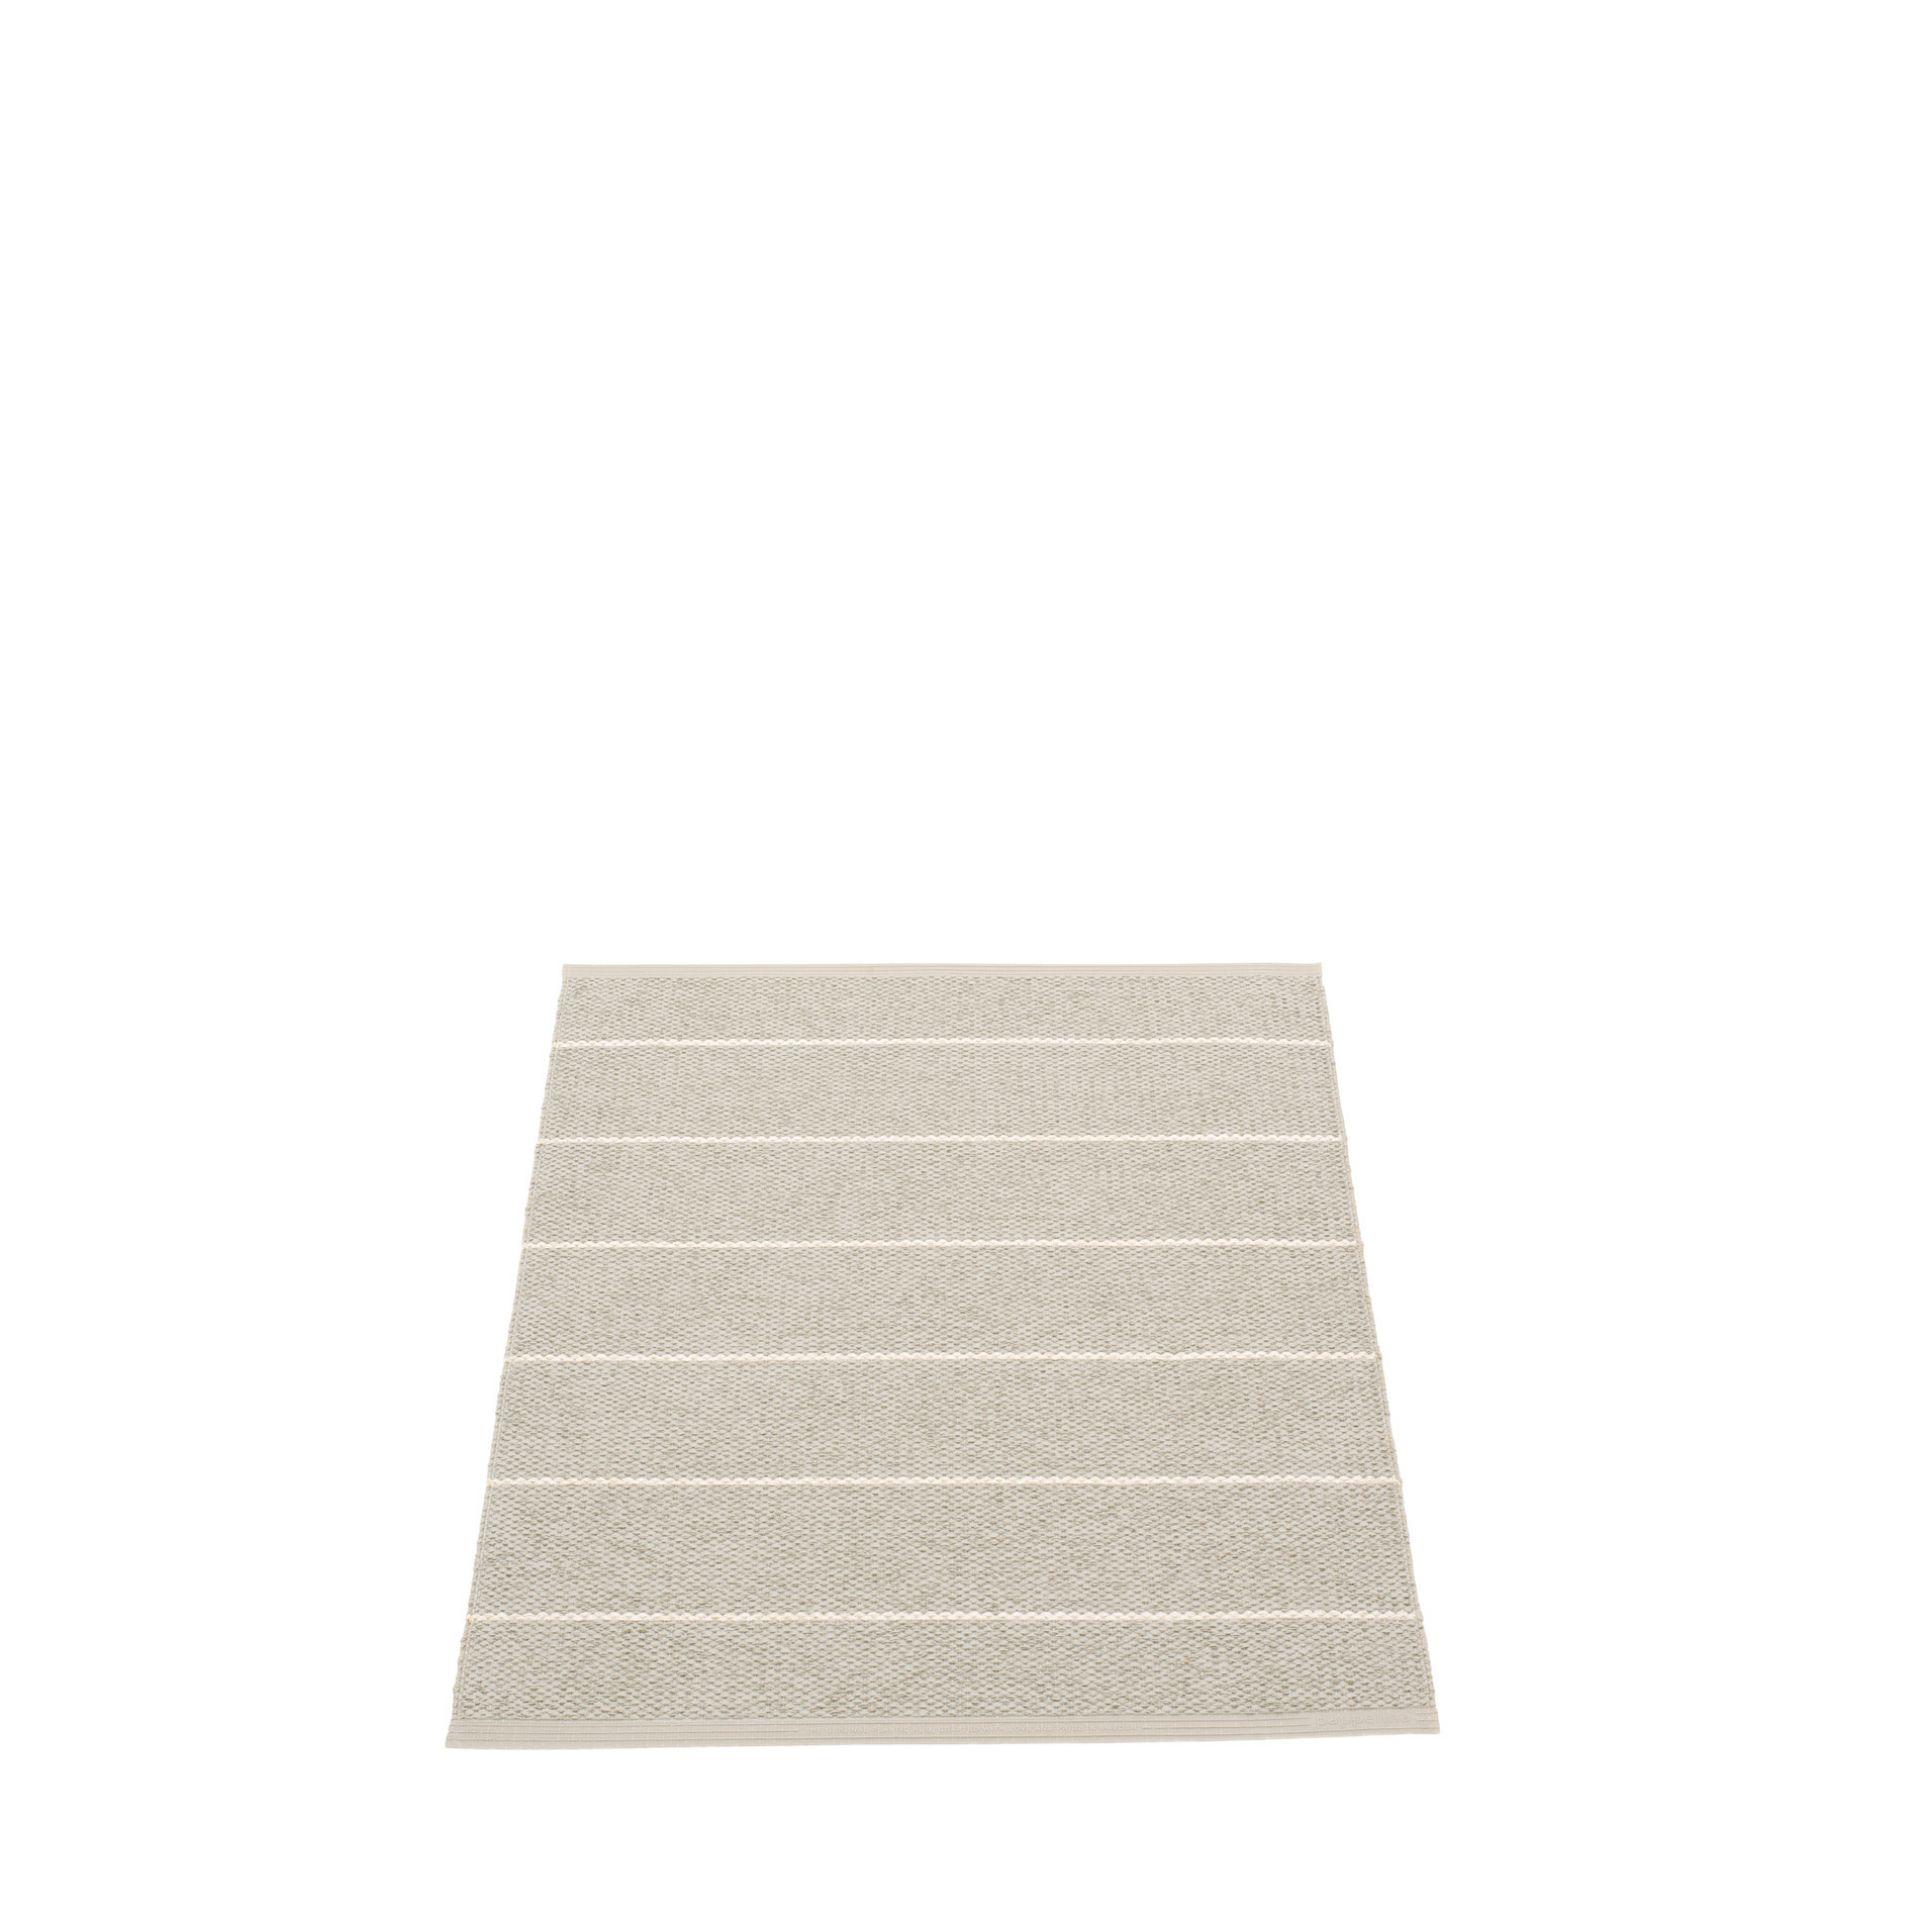 Carl Kunststoffteppich 70x90 cm Pappelina Leinen/ Beige